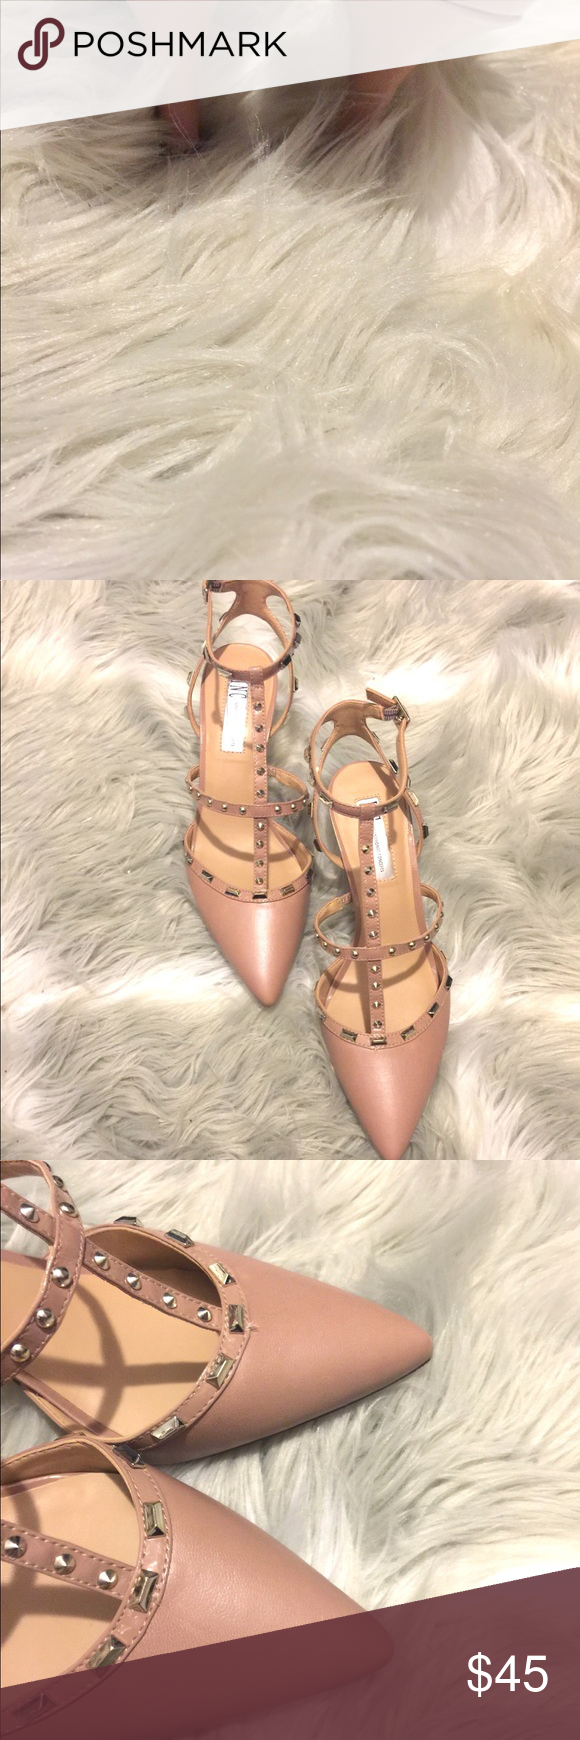 "f1e284ed425 INC Carma pointed toe Kitten Heels Pumps Worn once INC International  Concept studded kitten heels pumps. 2 1 2"" heels. LIKE NEW WITH BOX Shoes  Heels"